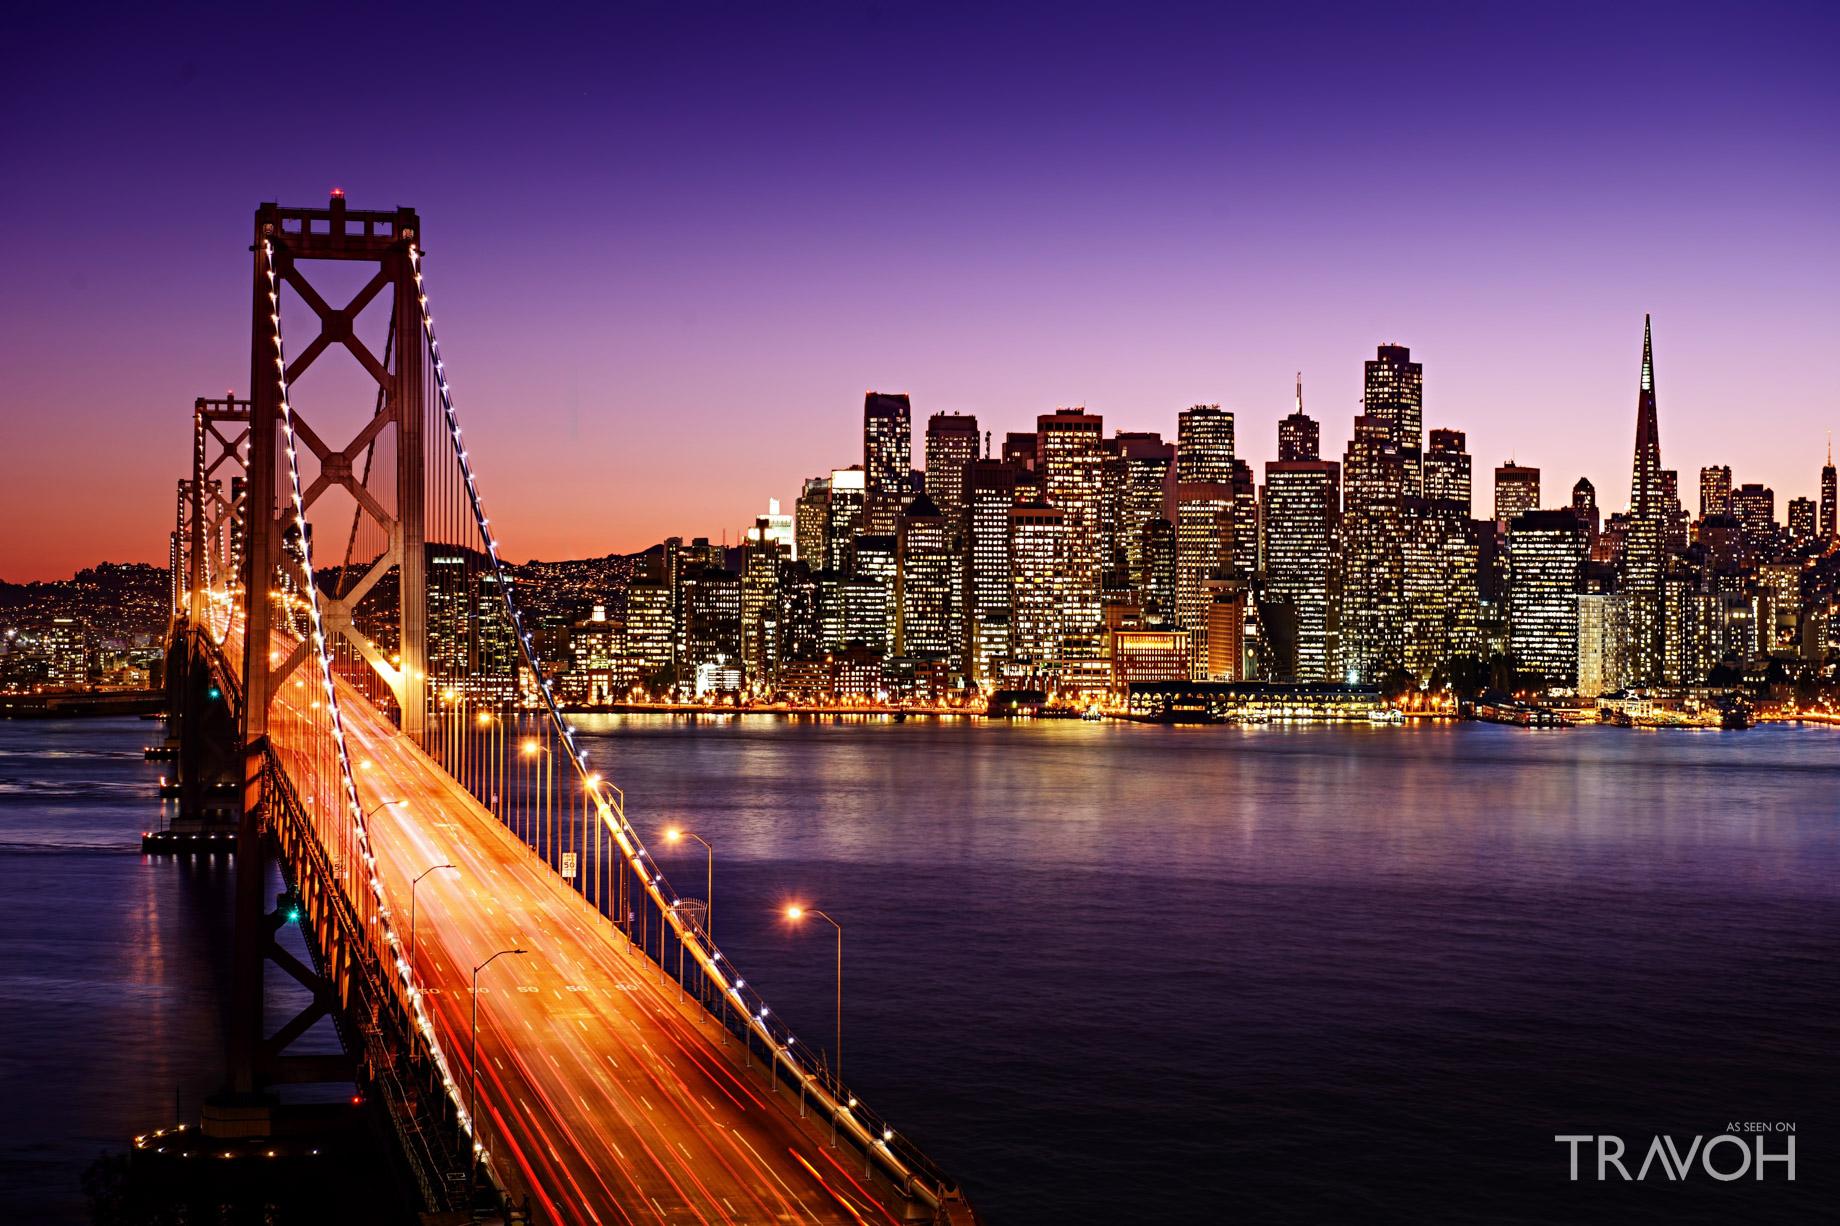 Bay Bridge - San Francisco - Oakland Bay Bridge - San Francisco, CA, USA